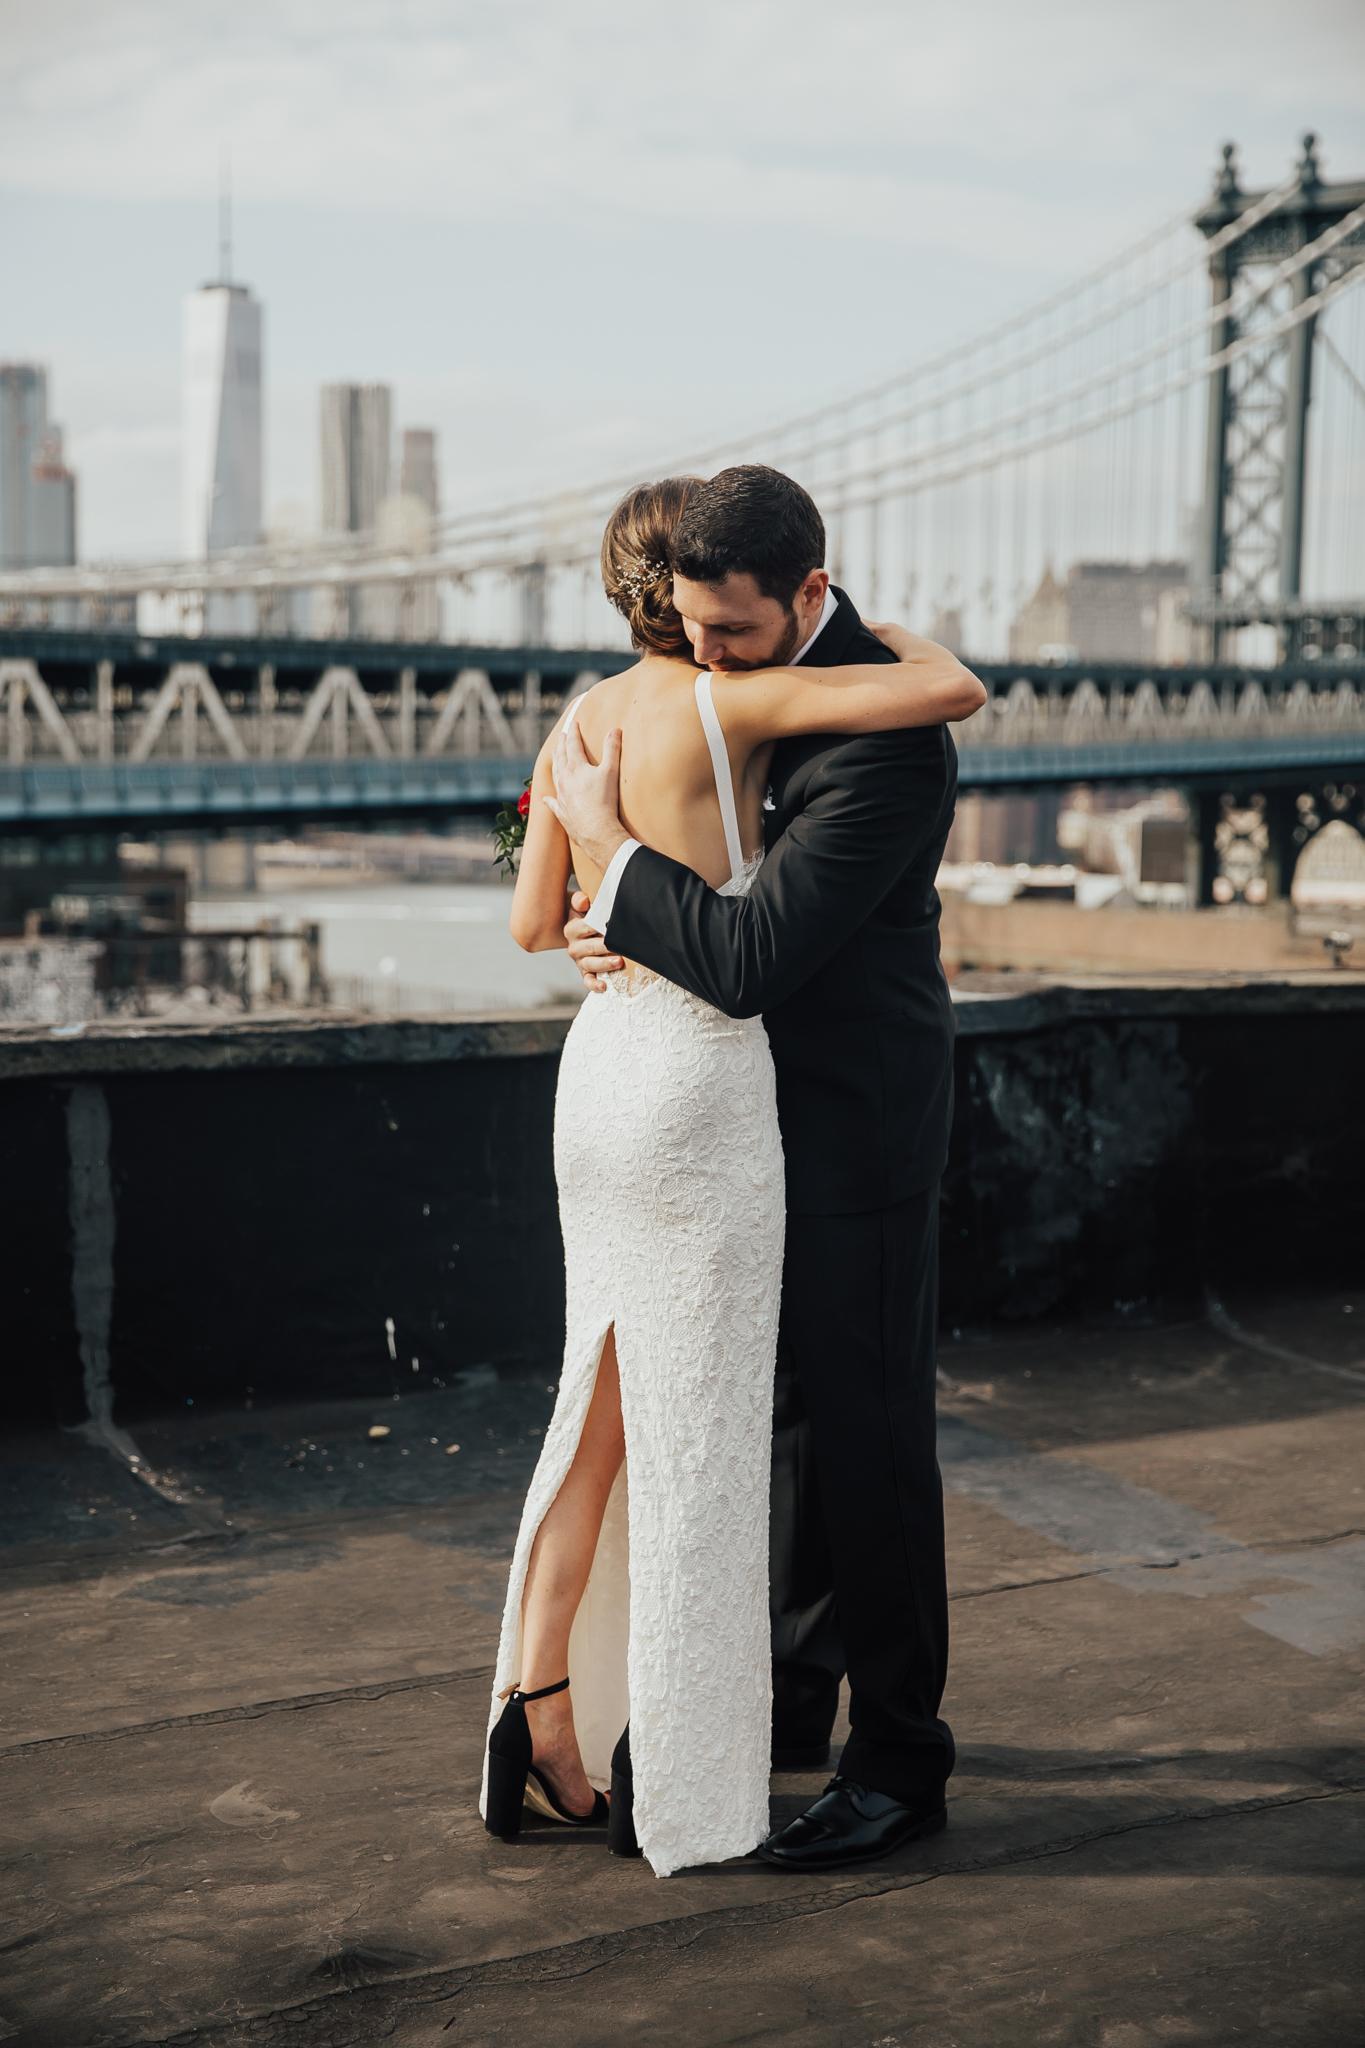 26-bridge-wedding-brooklyn-009.JPG